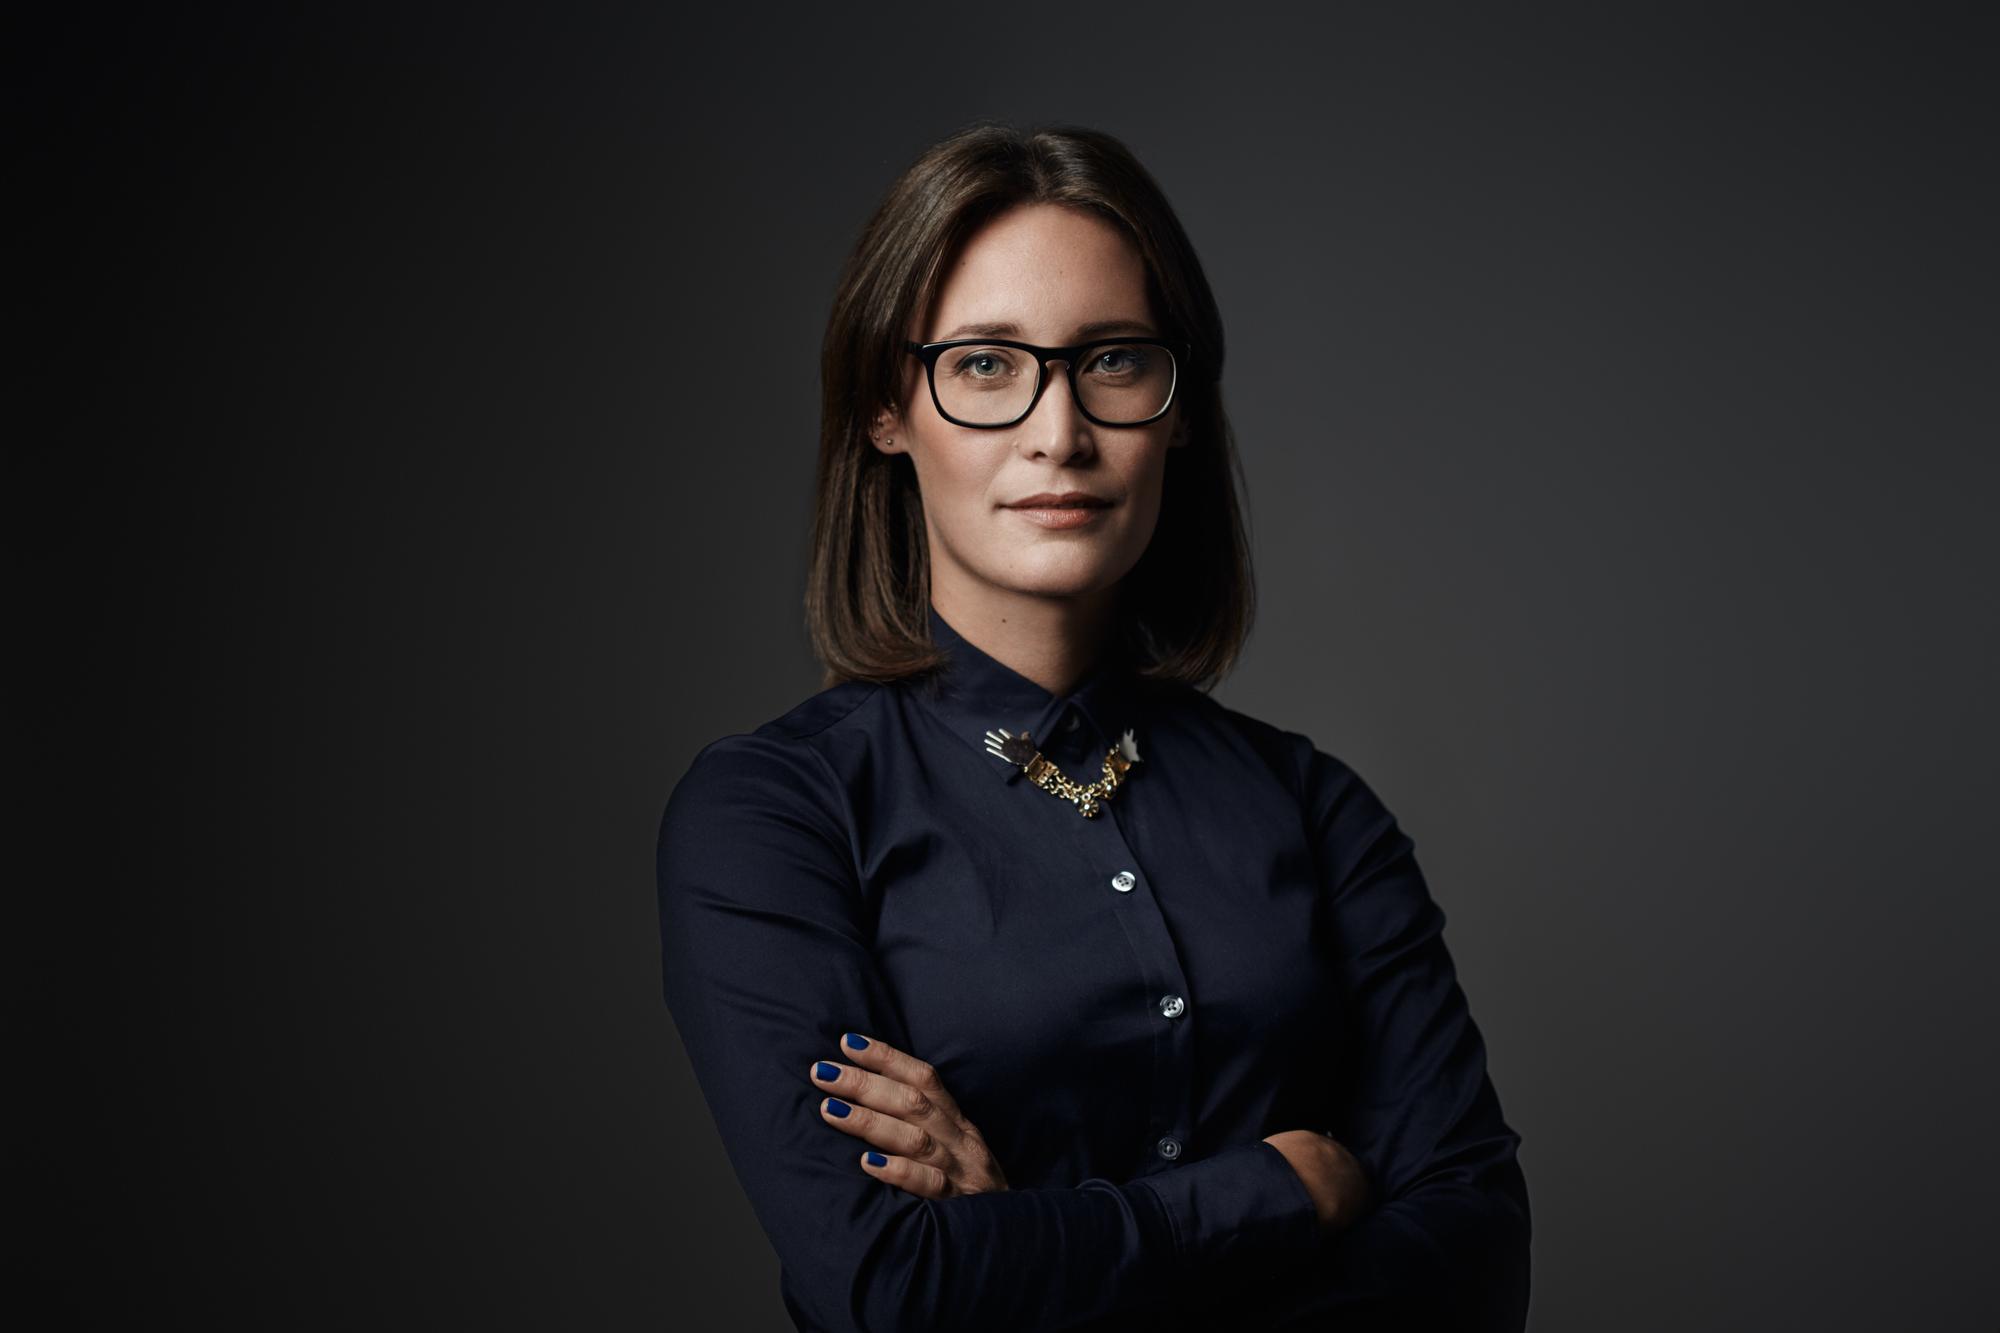 Mercedes Lalanne